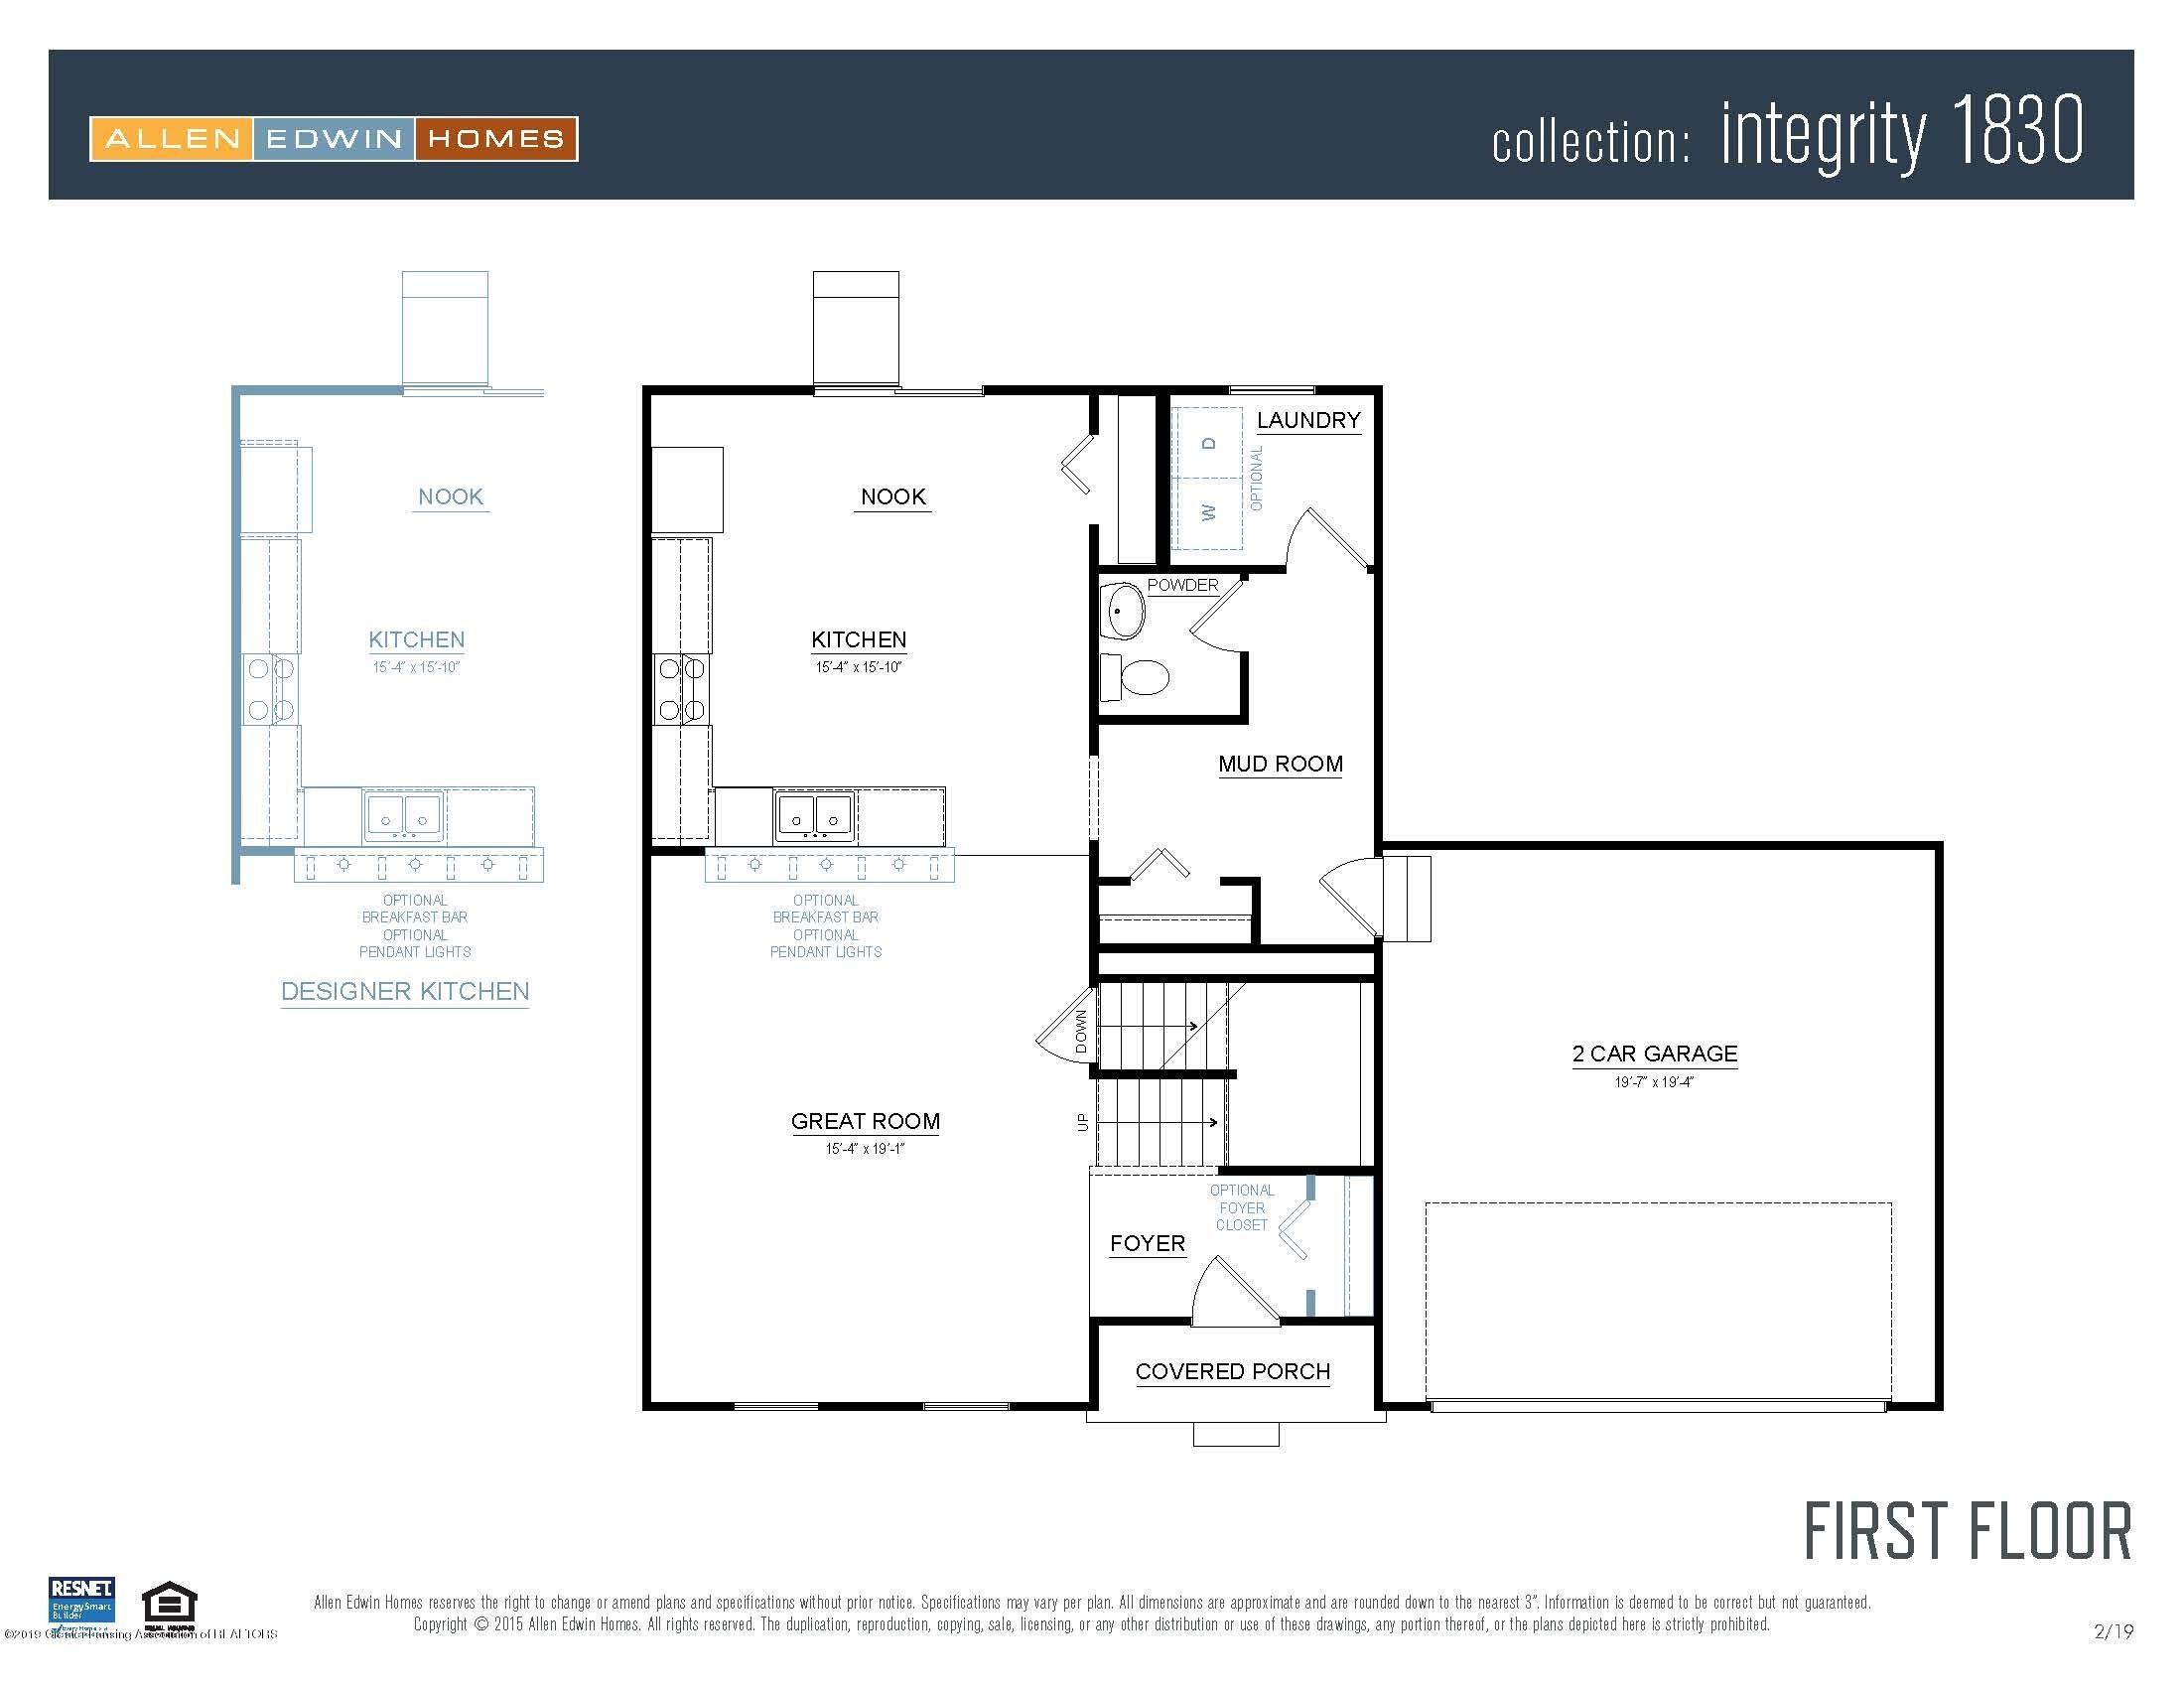 234 Noleigh - Integrity 1830 V8.1a First Floor - 4